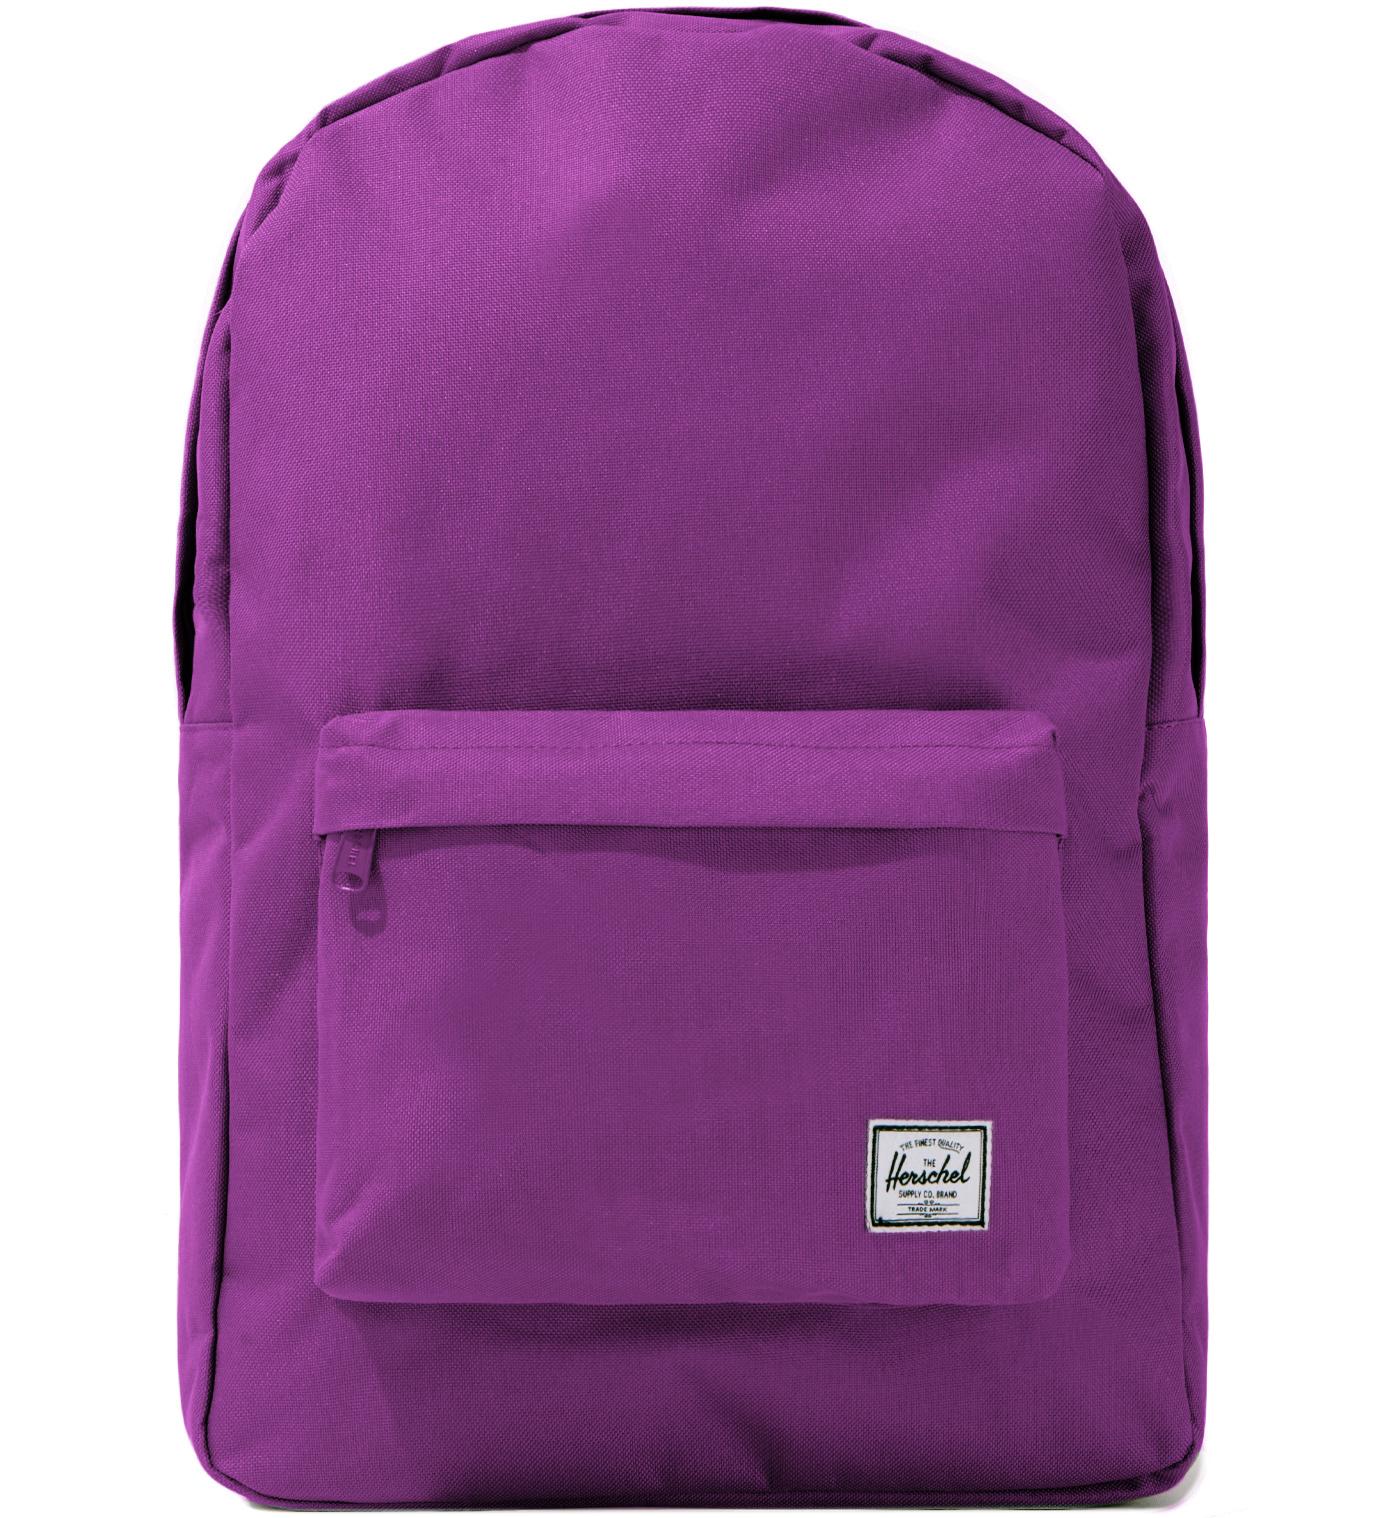 Herschel Supply Co. Purple Classic Backpack